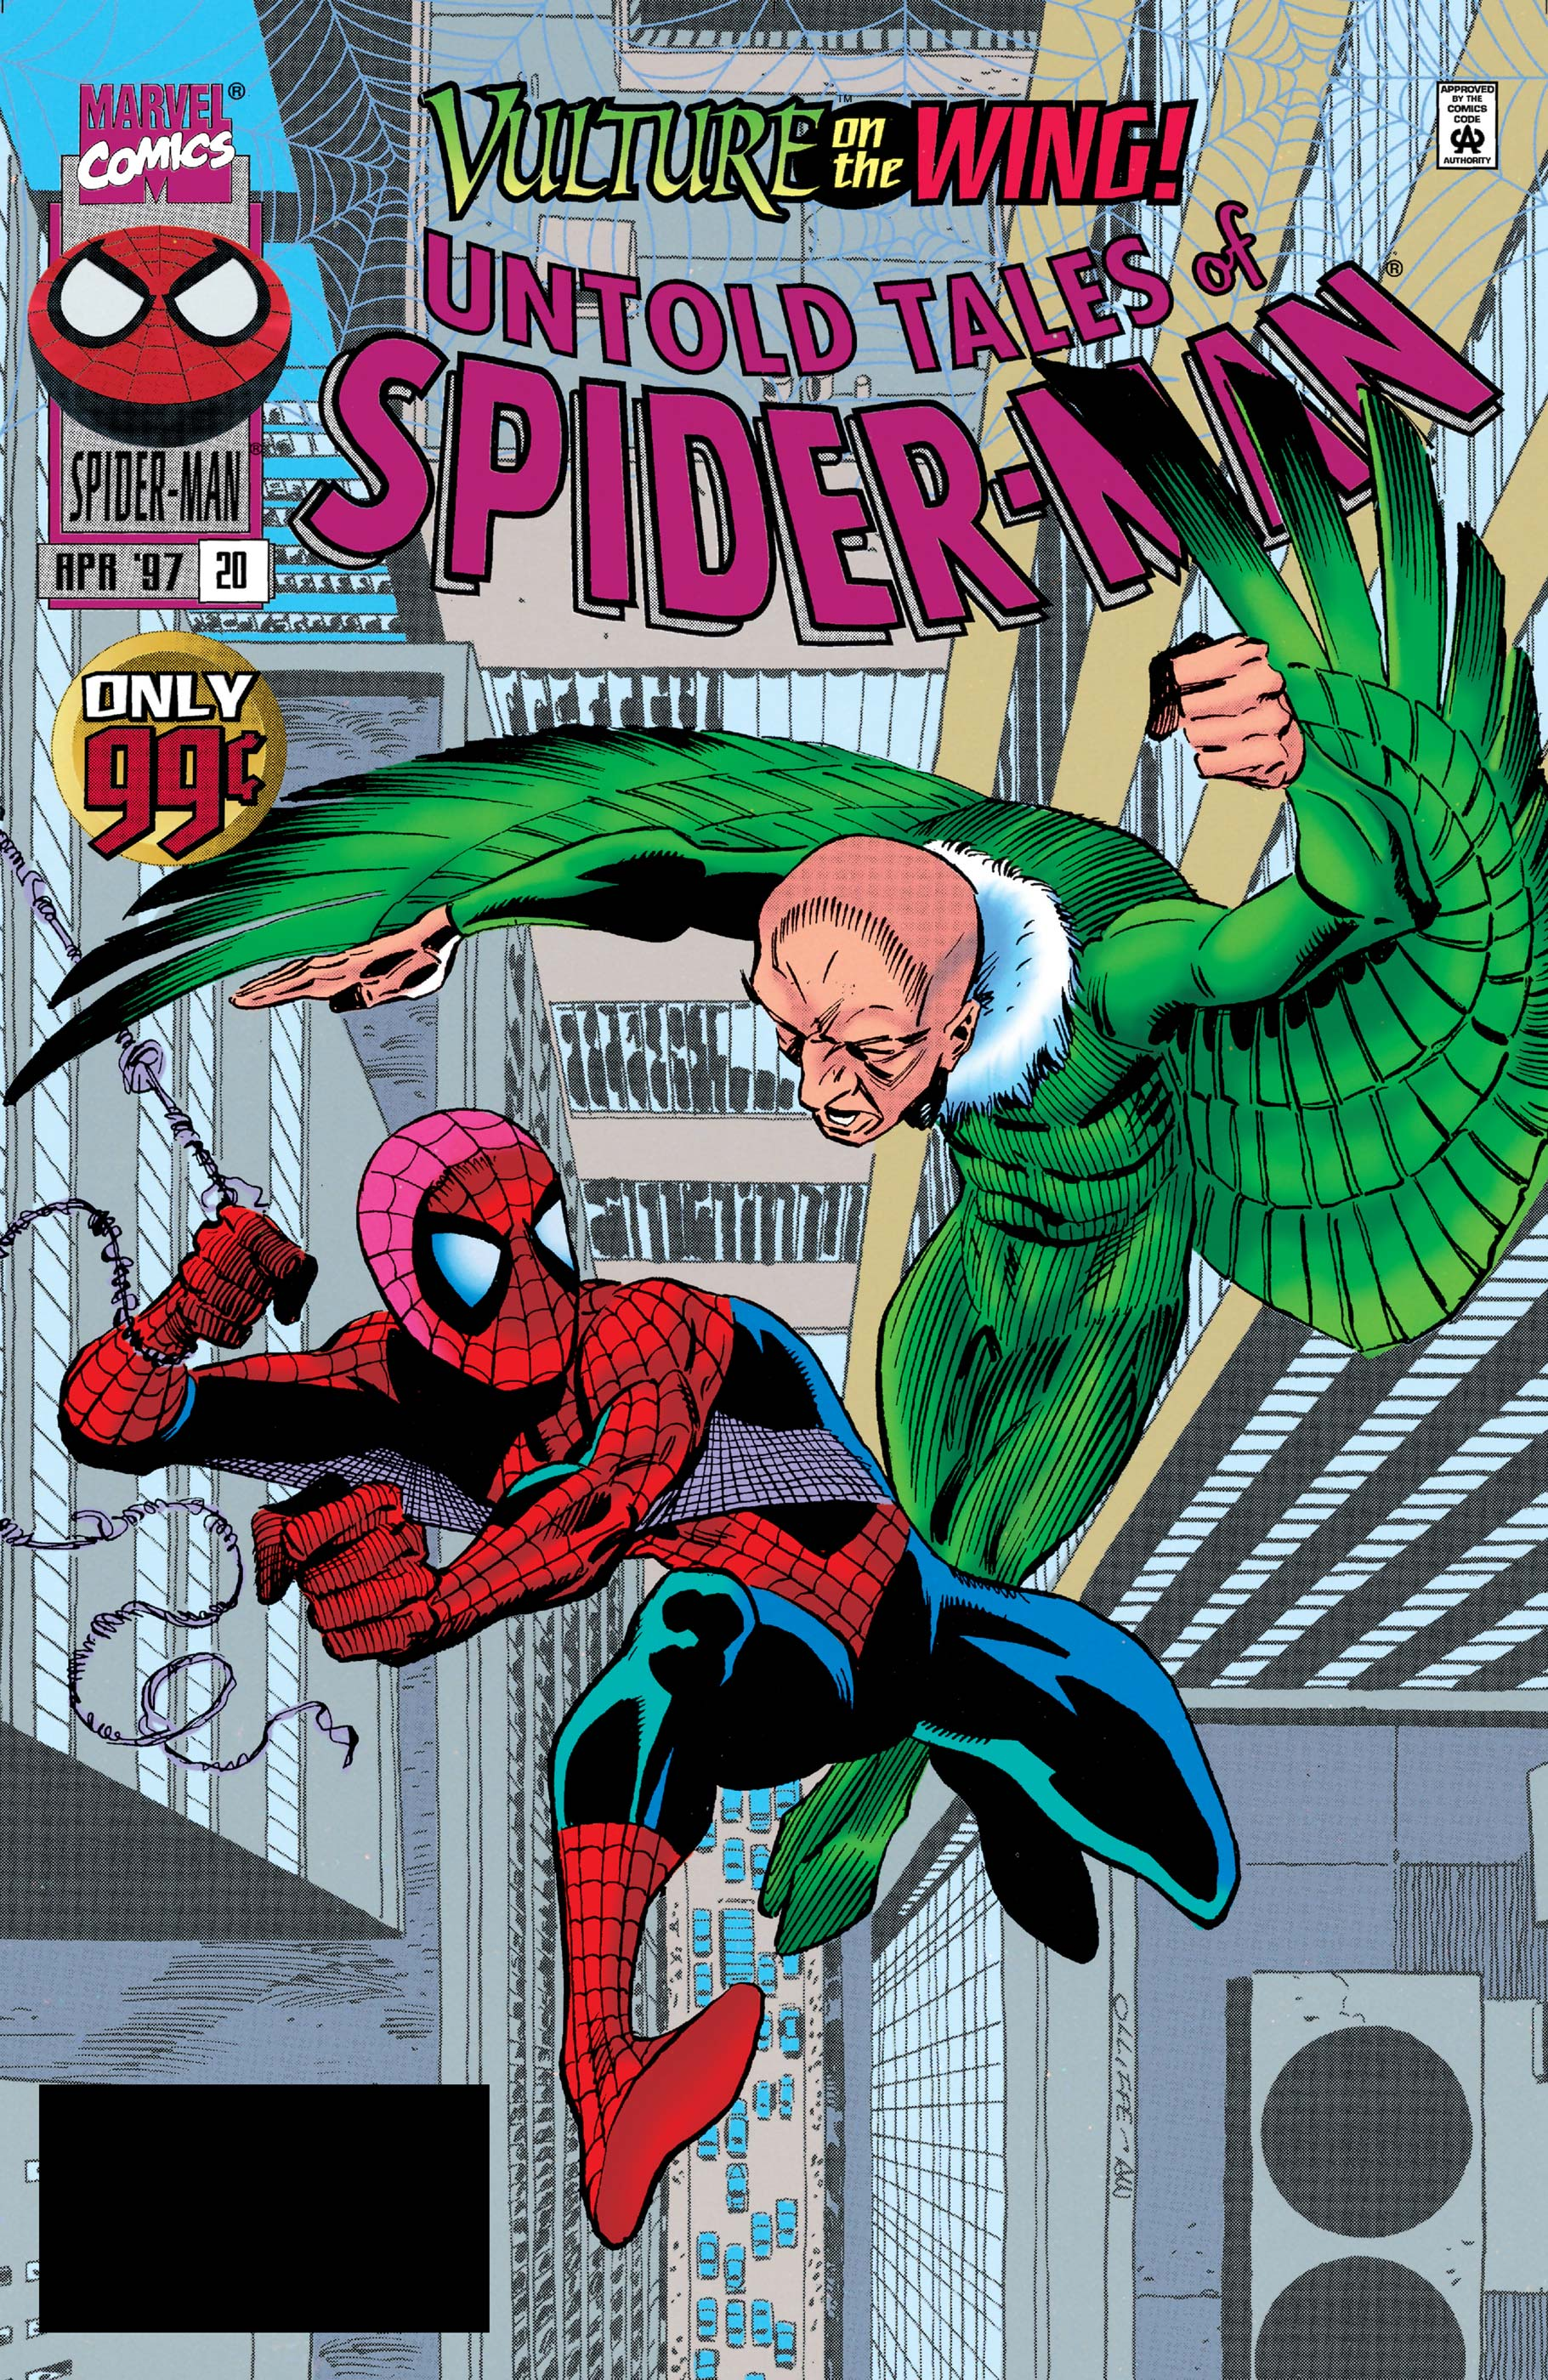 Untold Tales of Spider-Man (1995) #20